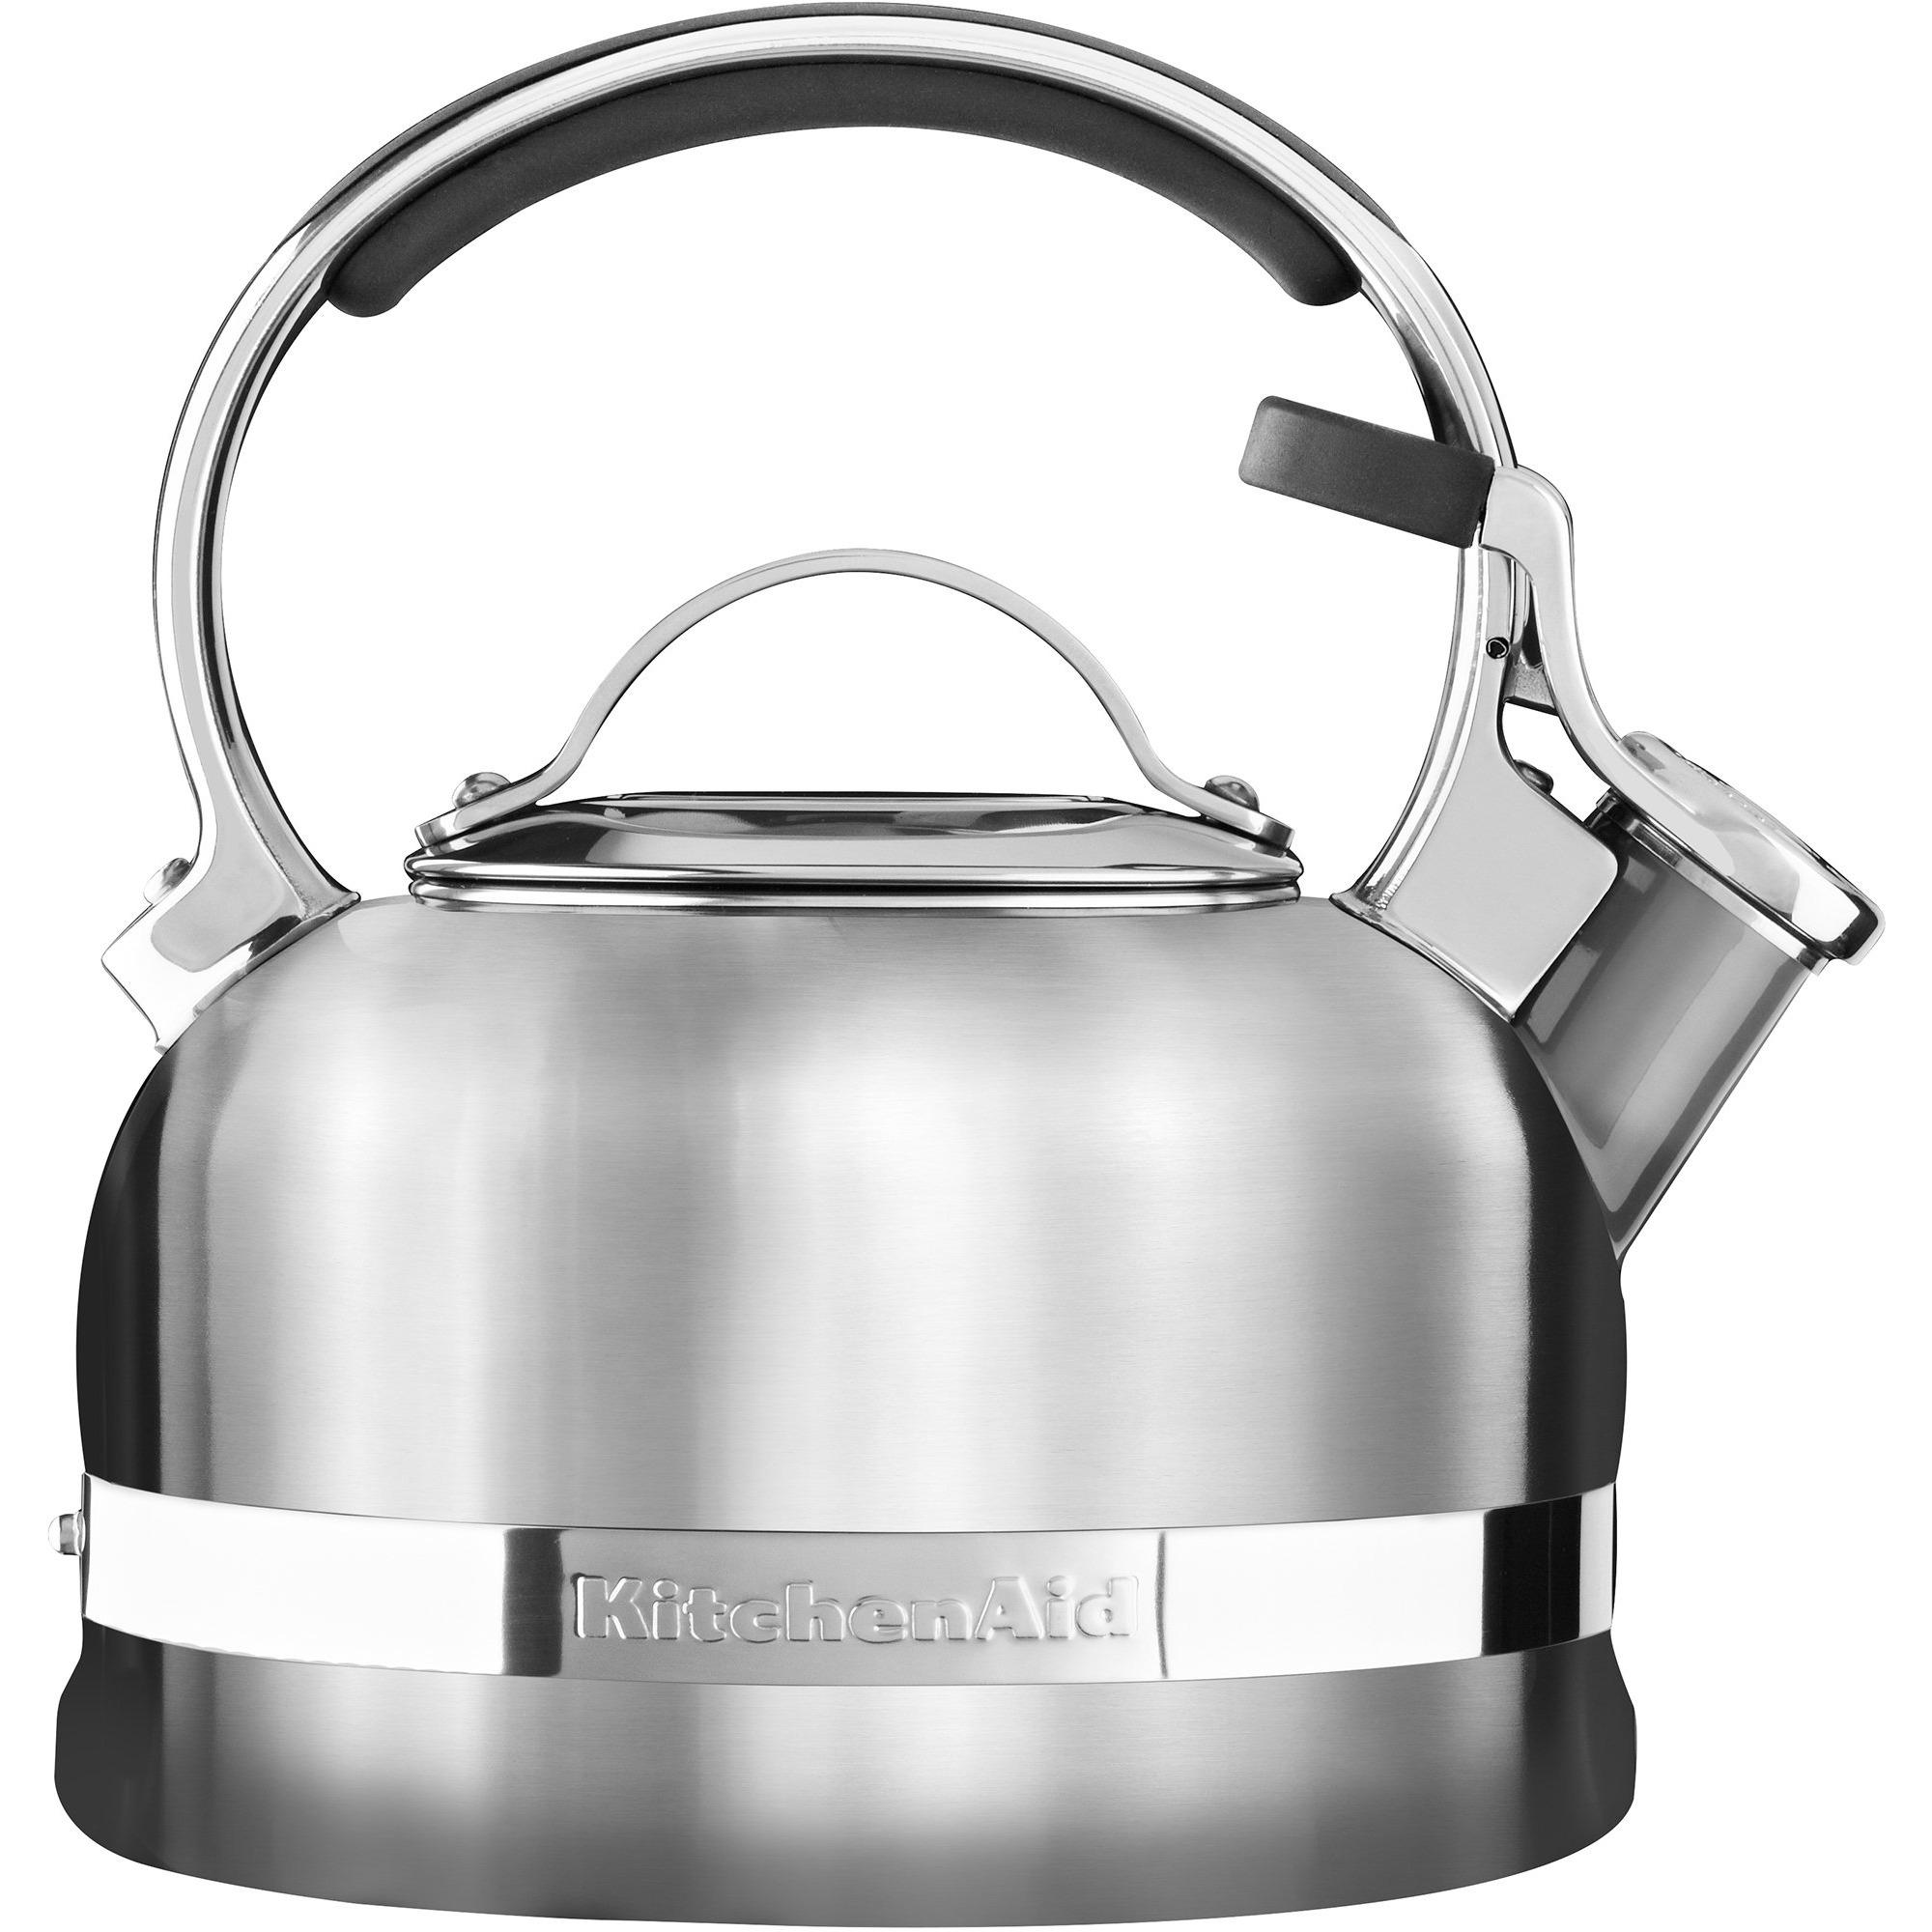 KitchenAid Pipkittel Stål 19 liter